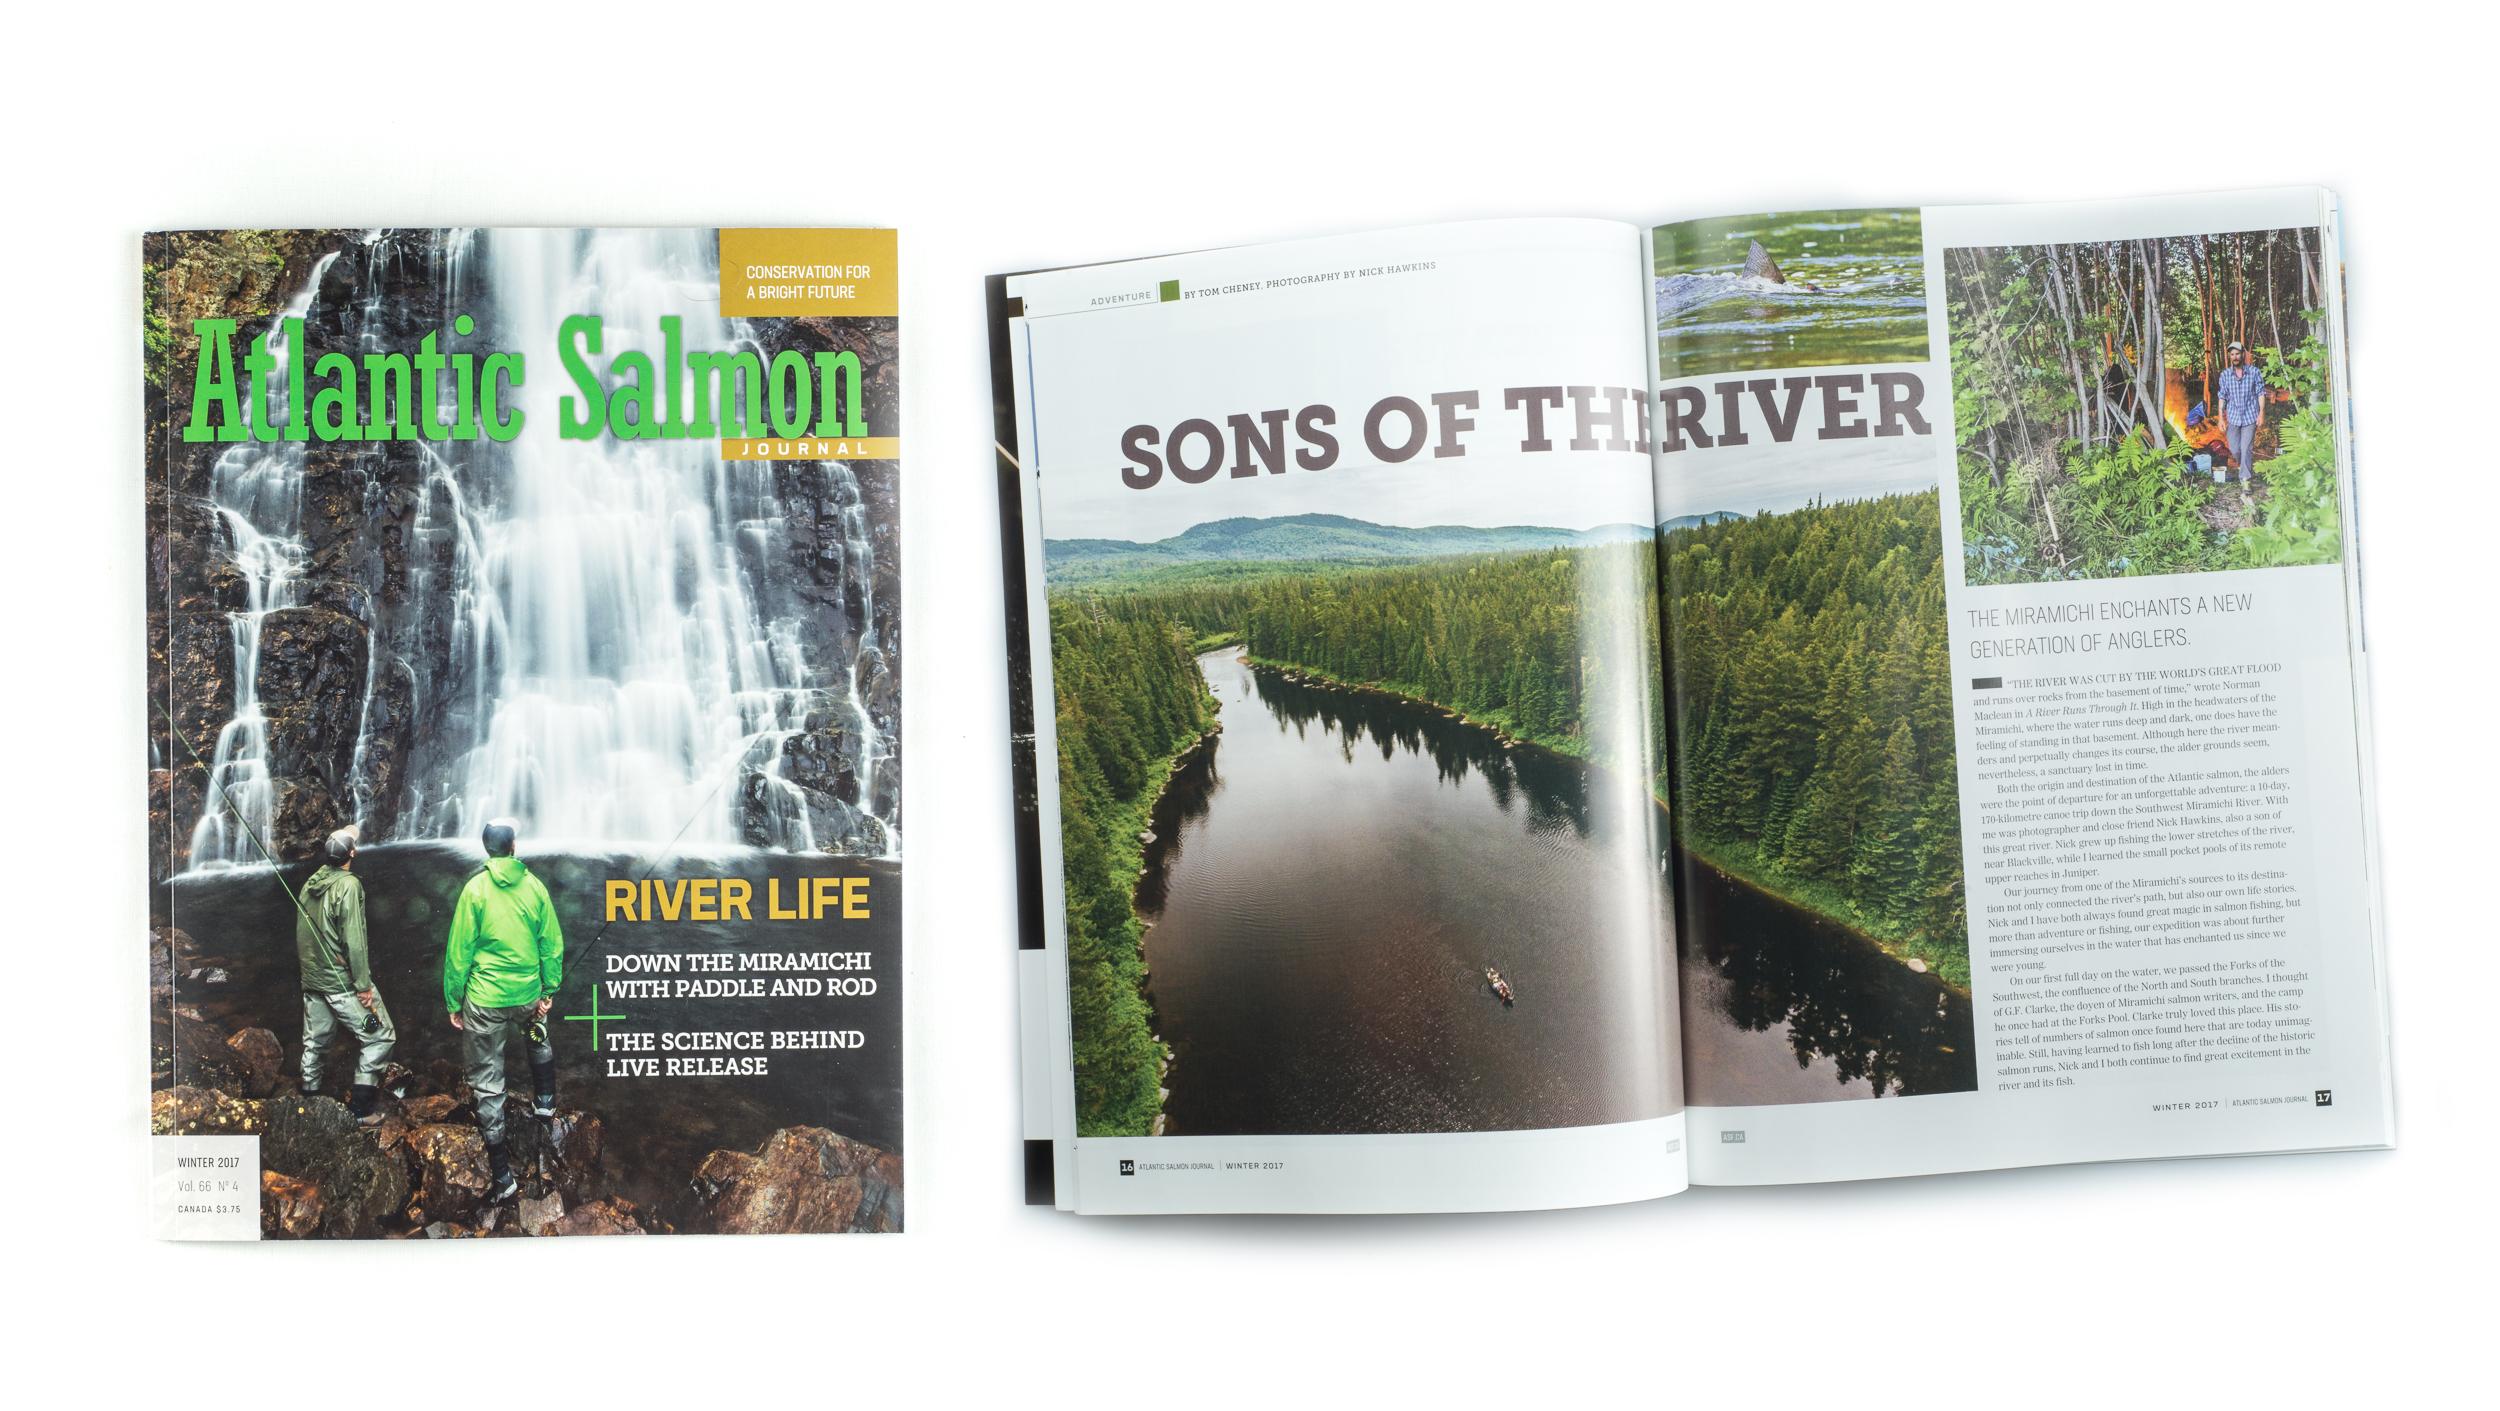 ASJ-Song-of-the-River-salmon-Spread.jpg